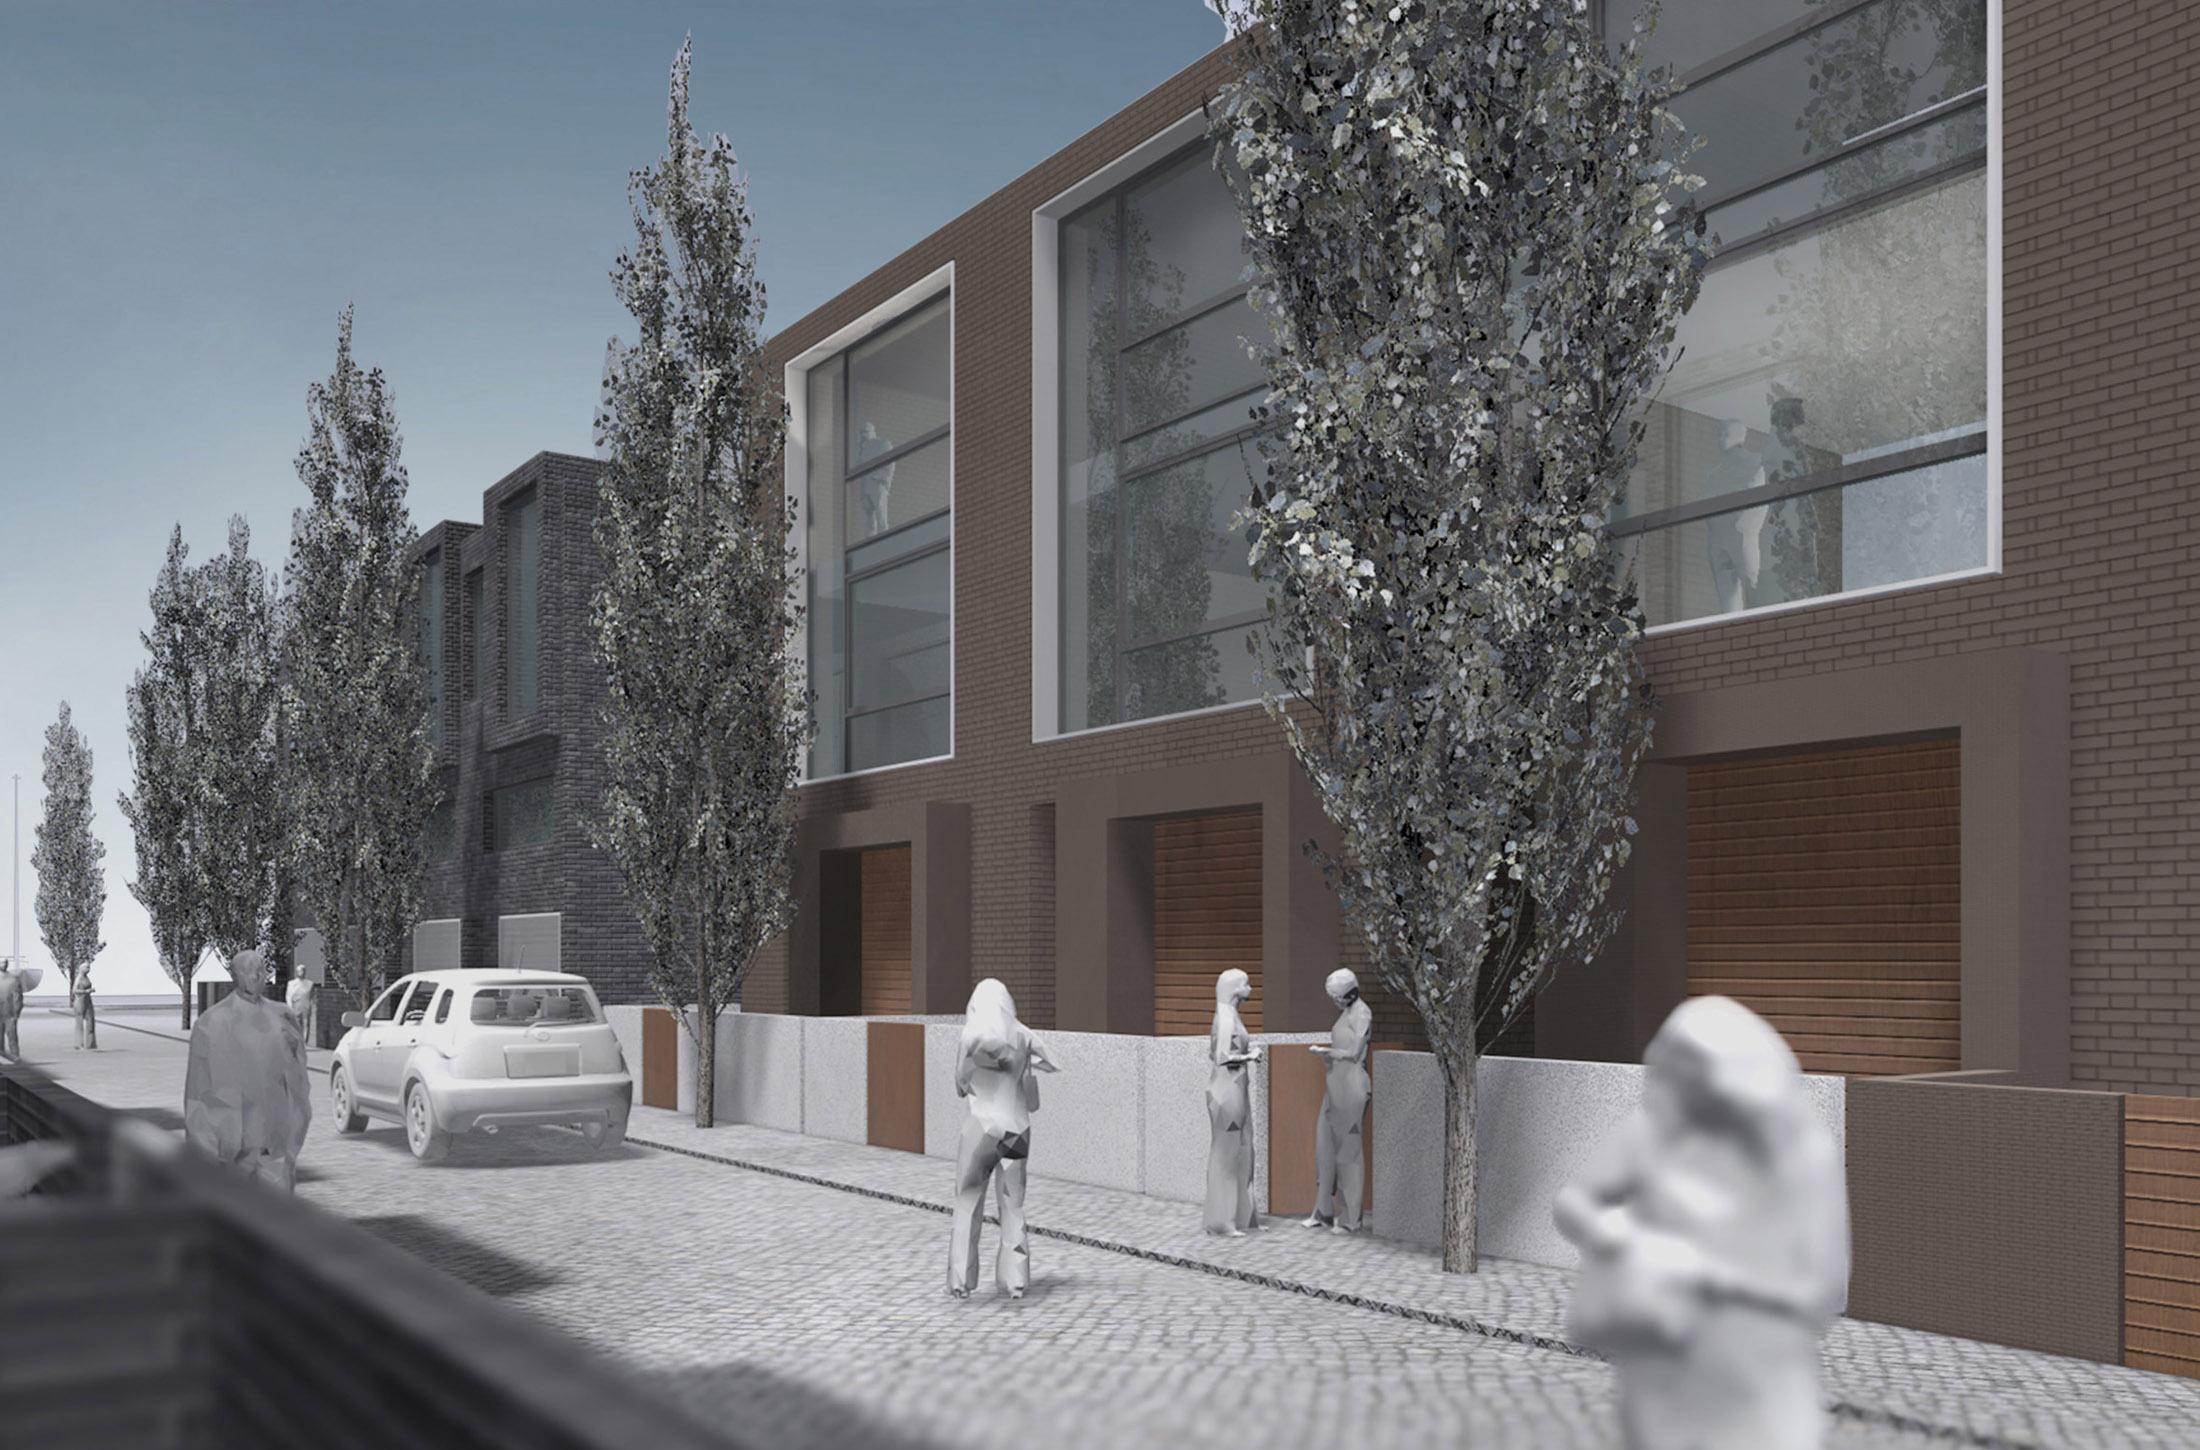 harburger schlossinsel hamburg dfz architekten. Black Bedroom Furniture Sets. Home Design Ideas